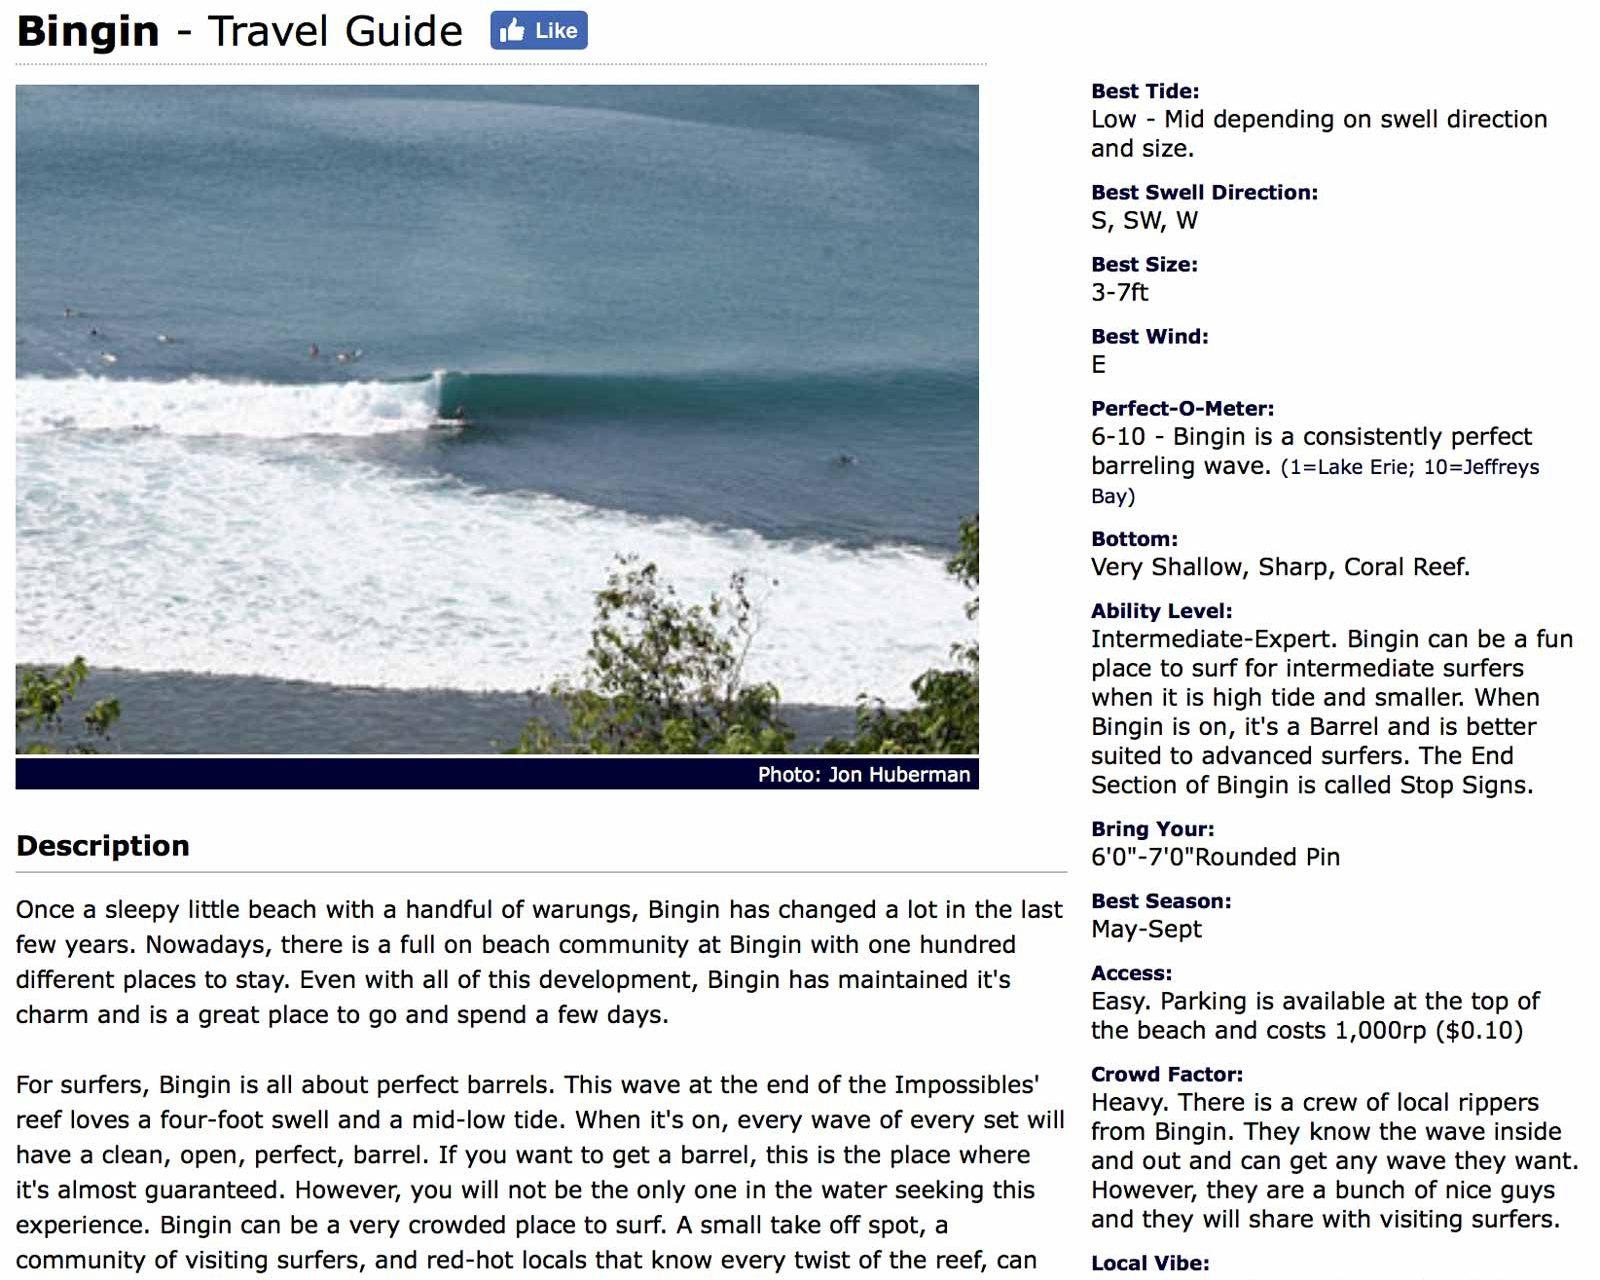 Bingin-Travel-Guide-Surfline